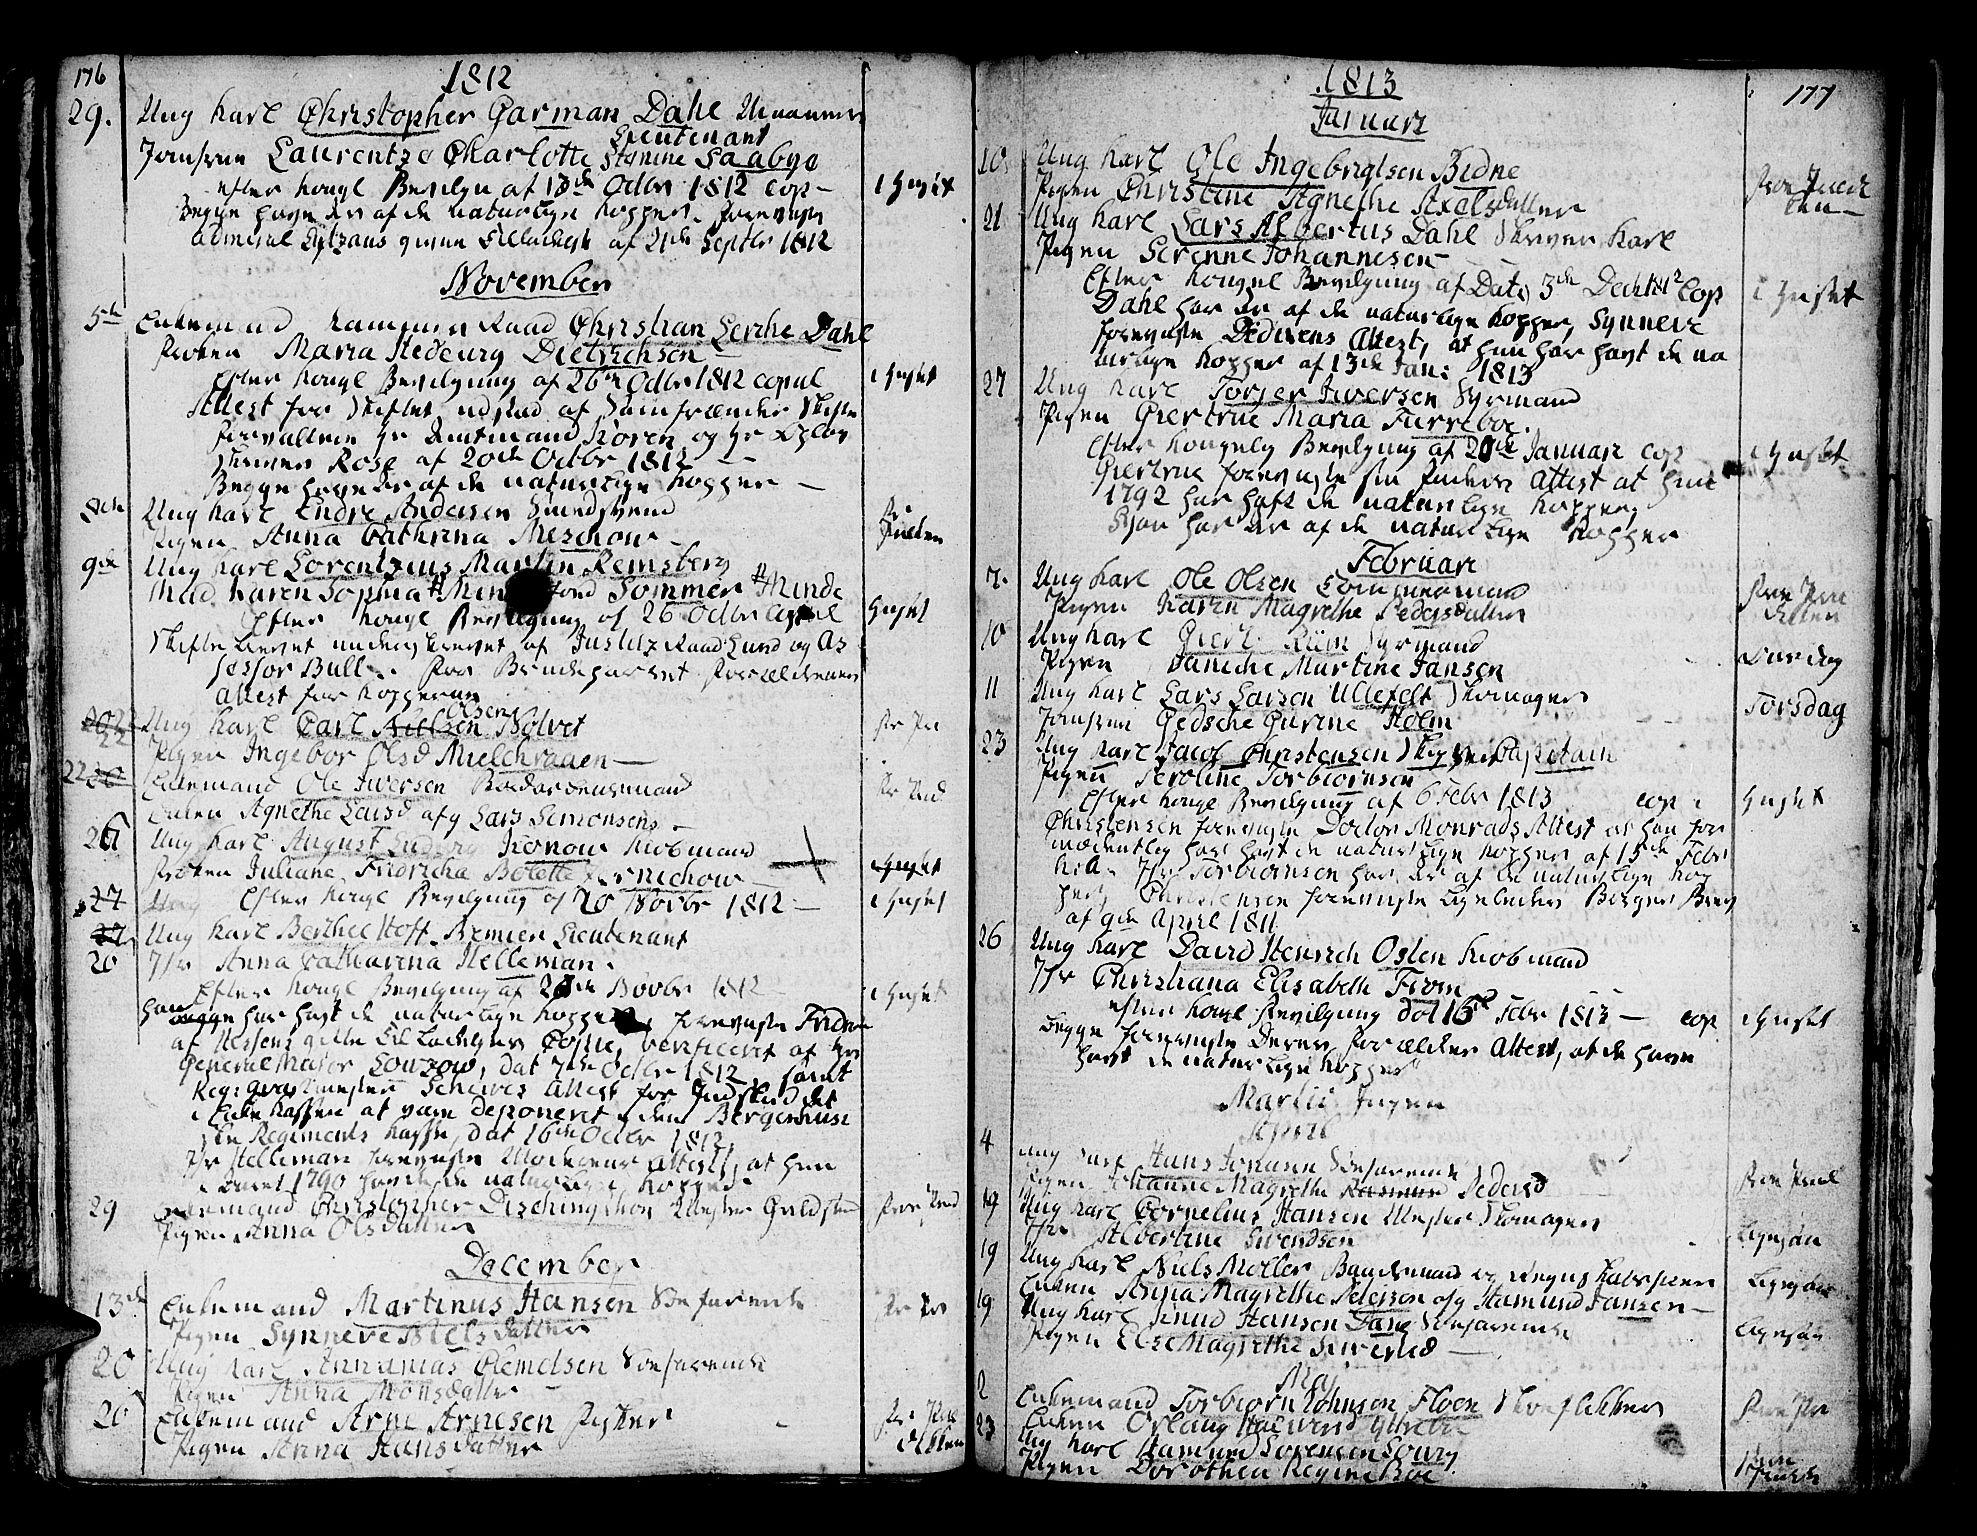 SAB, Domkirken Sokneprestembete, H/Haa/L0007: Ministerialbok nr. A 7, 1725-1826, s. 176-177